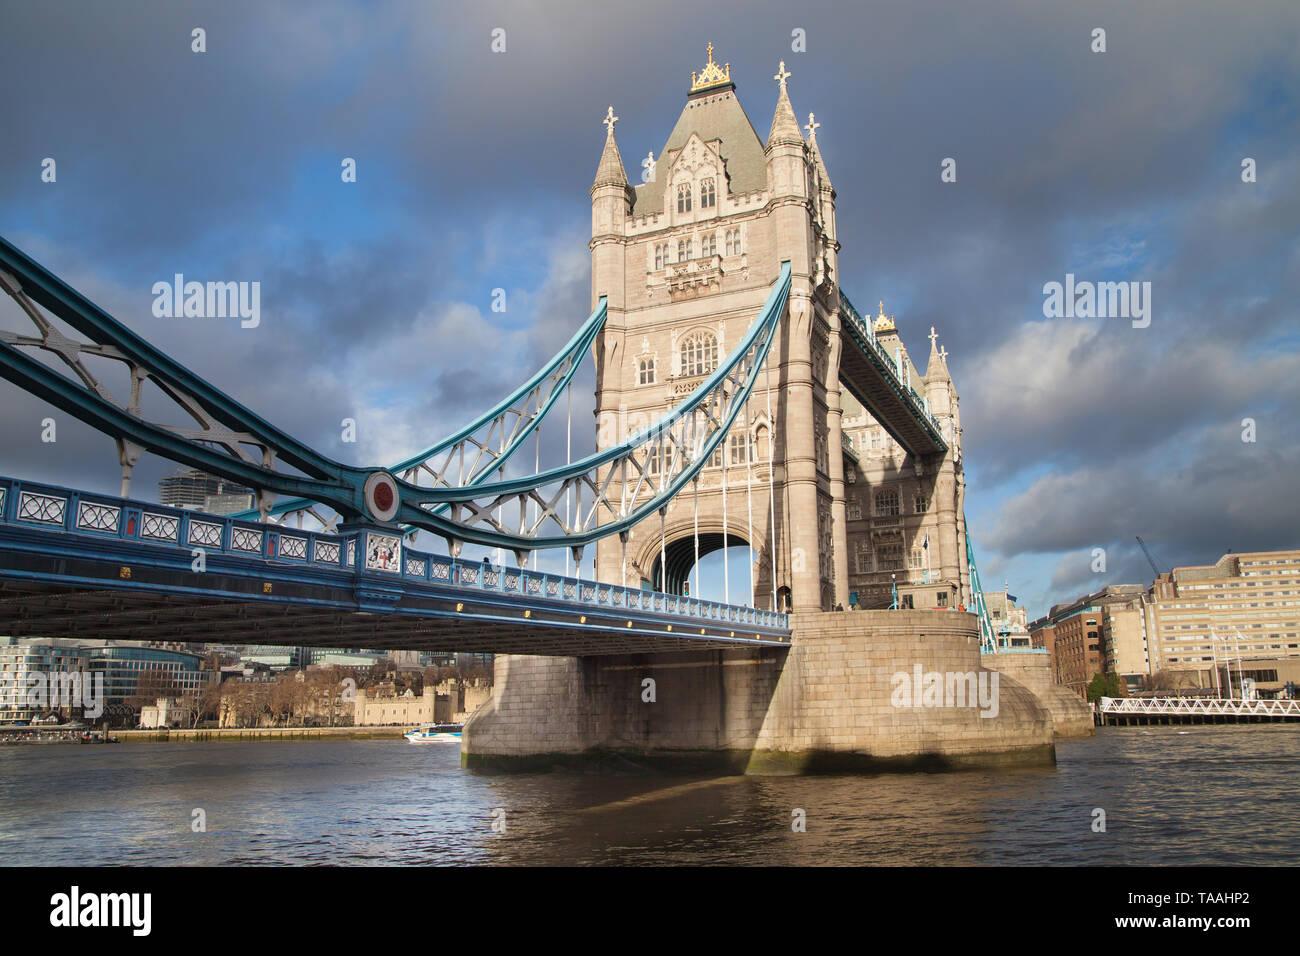 Tower Bridge from the Shad Thames, London, United Kingdom. Stock Photo